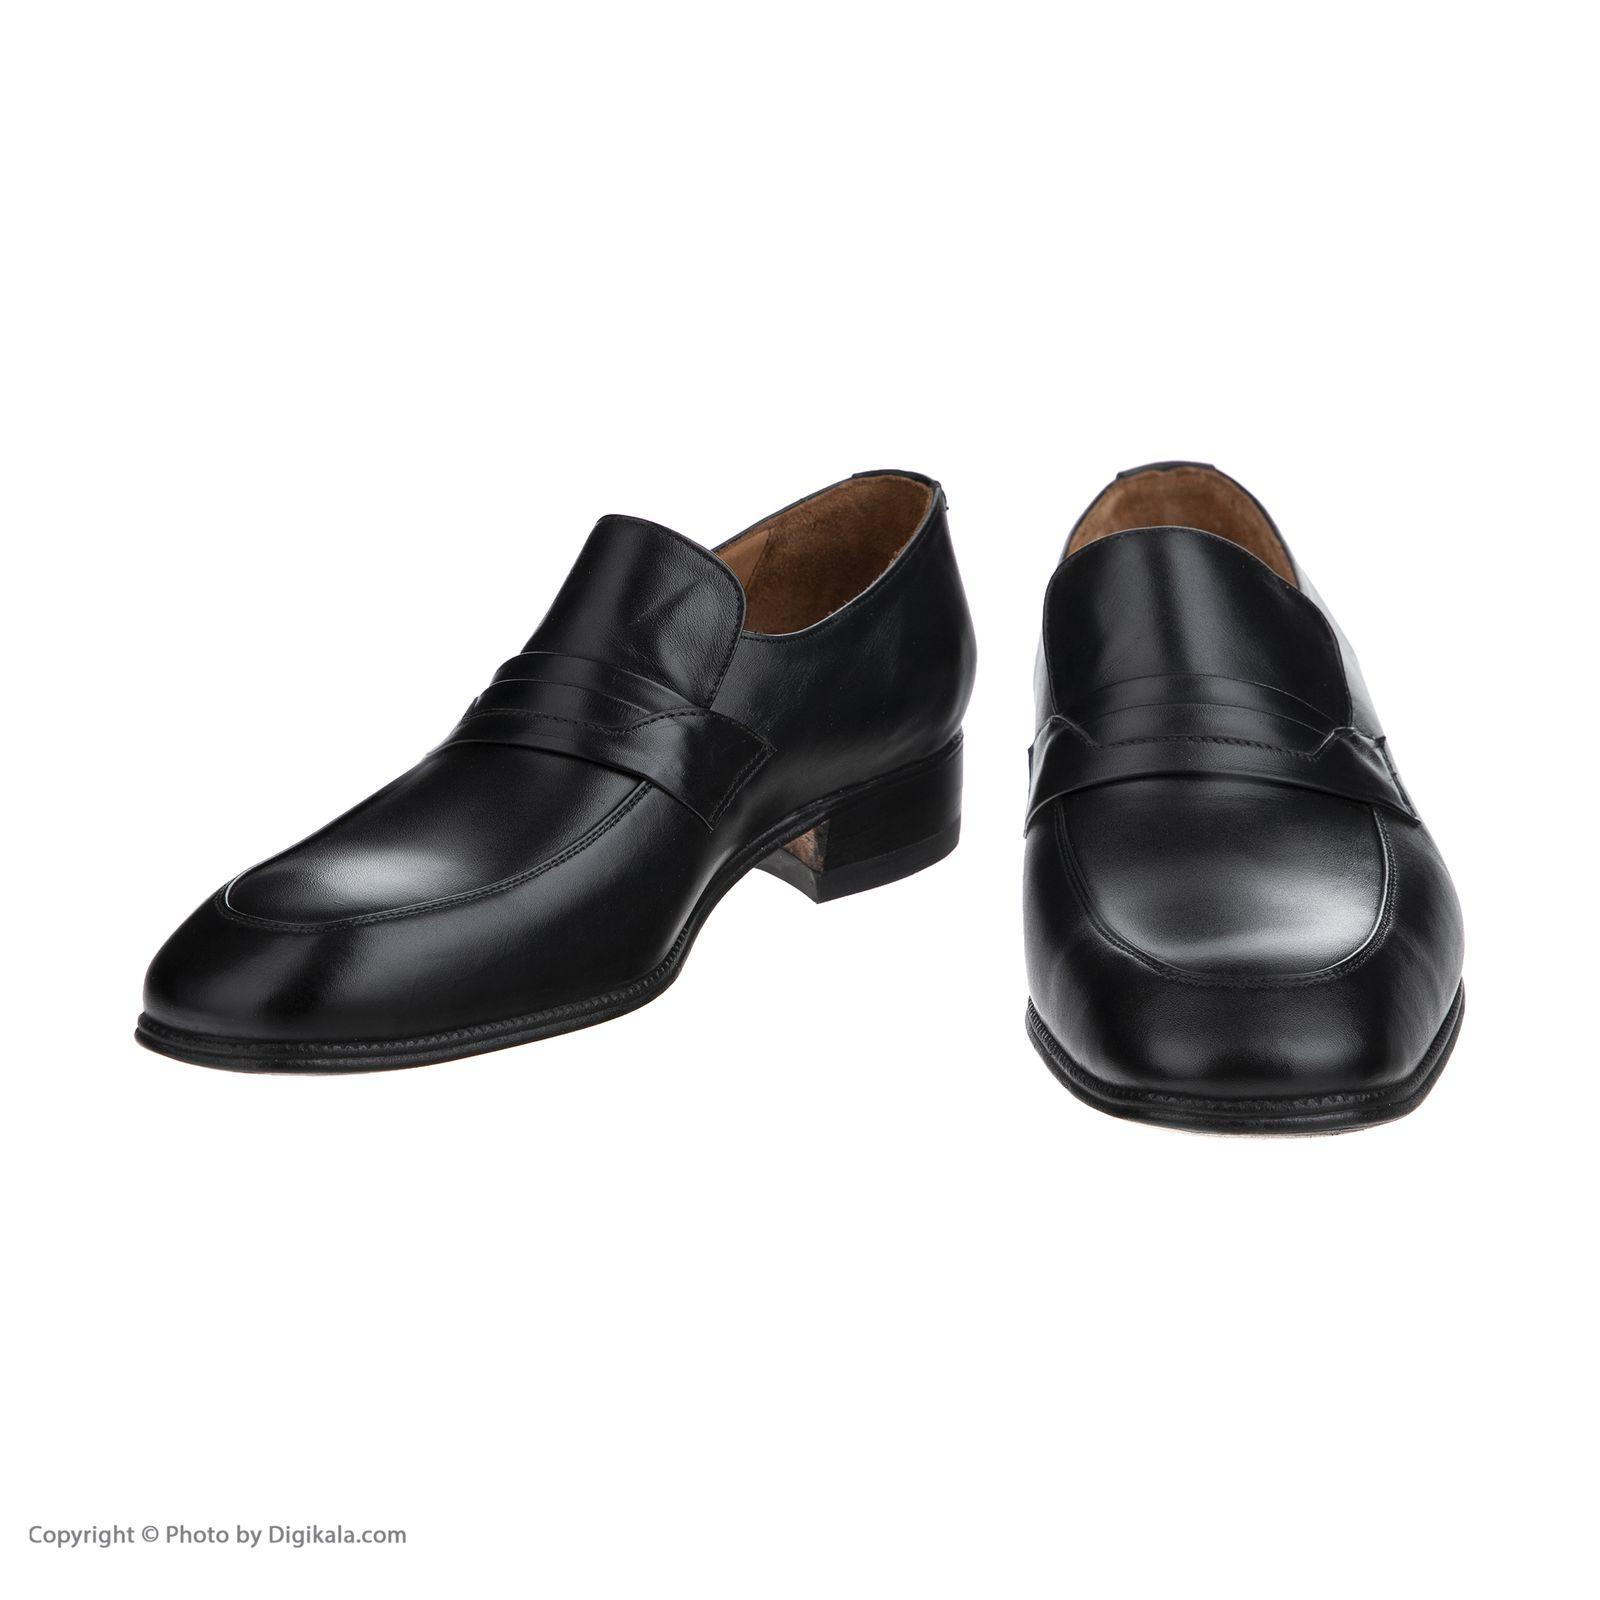 کفش مردانه نظری کد 416 -  - 4